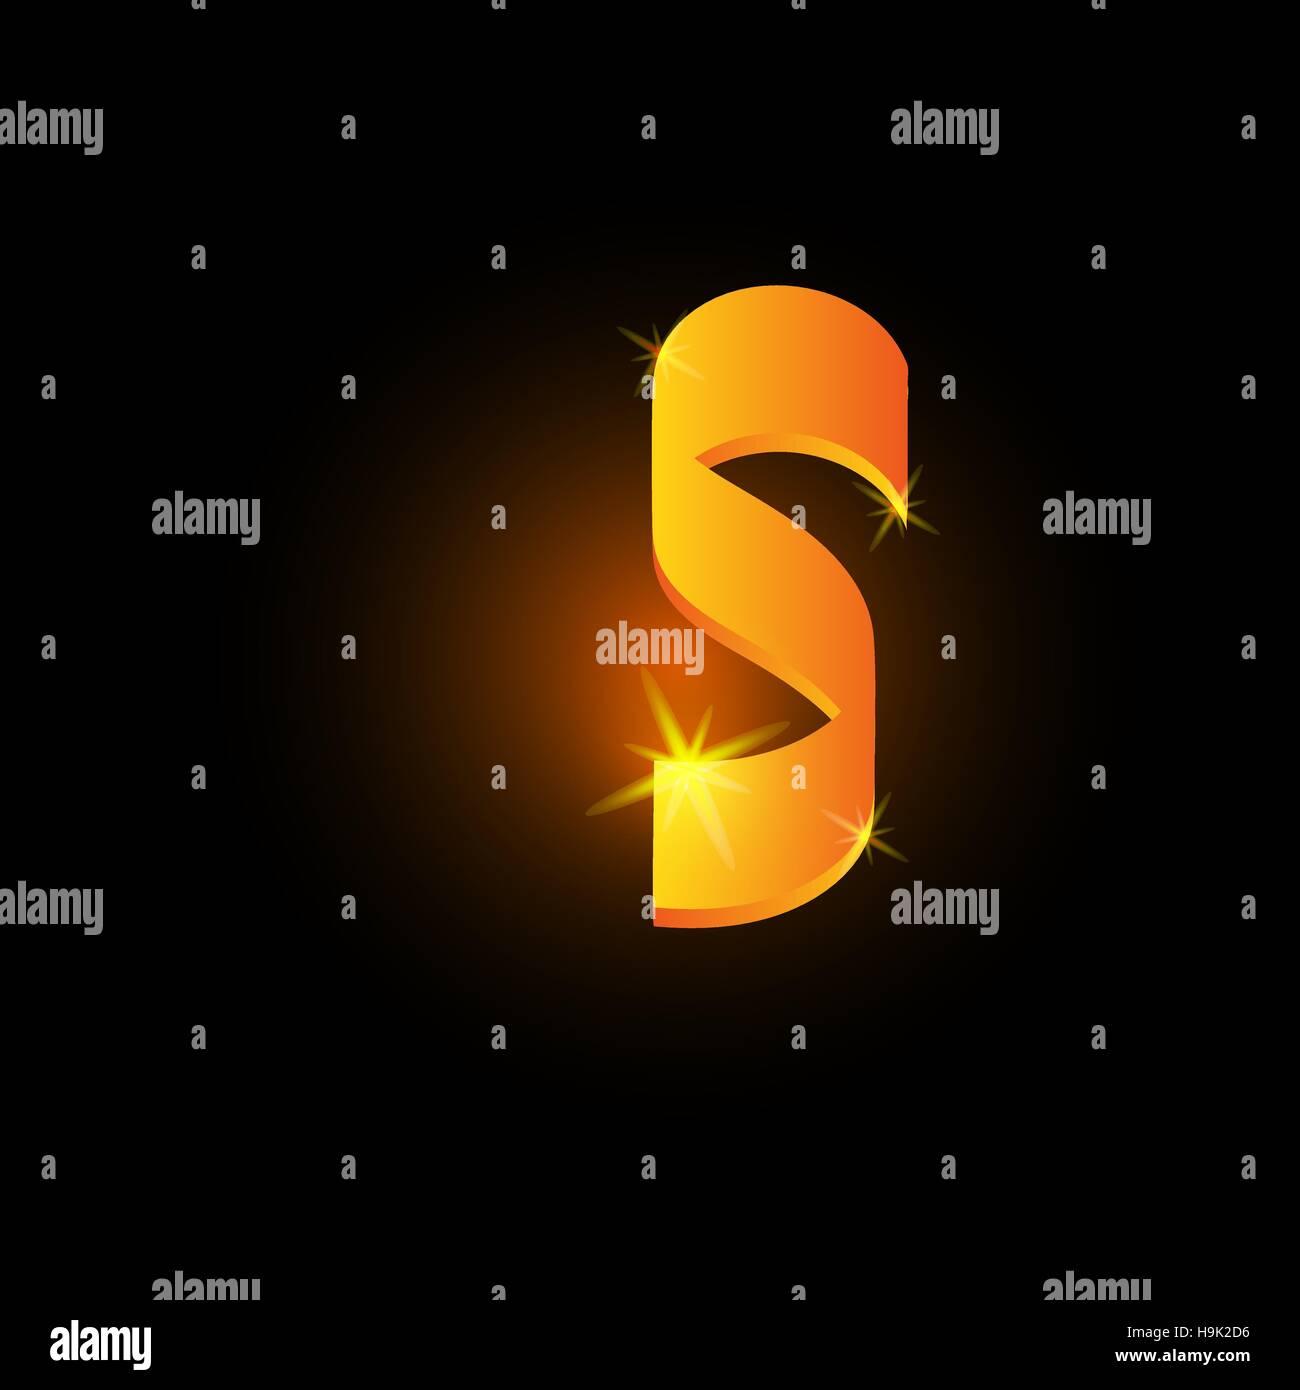 Golden arabic style letter s. Shiny latin alphabet element icon on black background. Oriental calligraphy design. - Stock Image